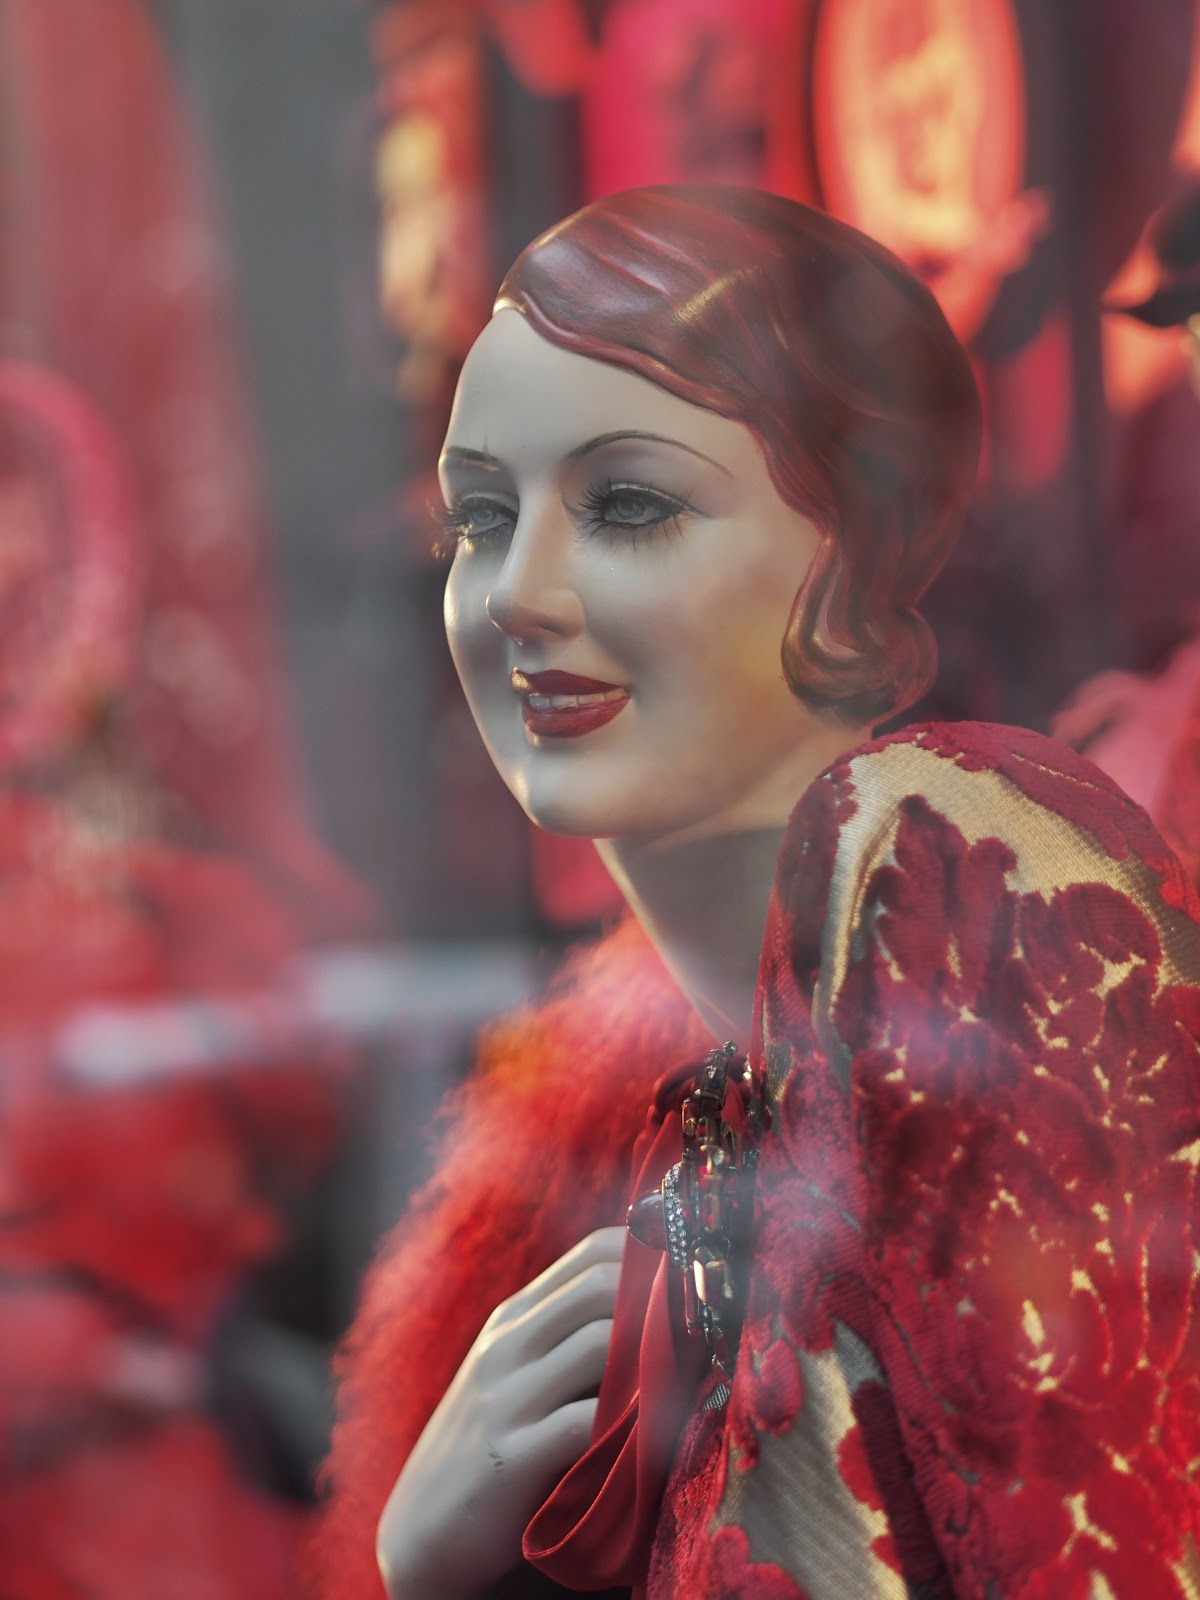 Red Head #redhead #bgwindows # #holidaywindows #5thavenuewindows #NYC  #holidays #besttimeoftheyear #nyc ©2014 Nancy Lundebjerg